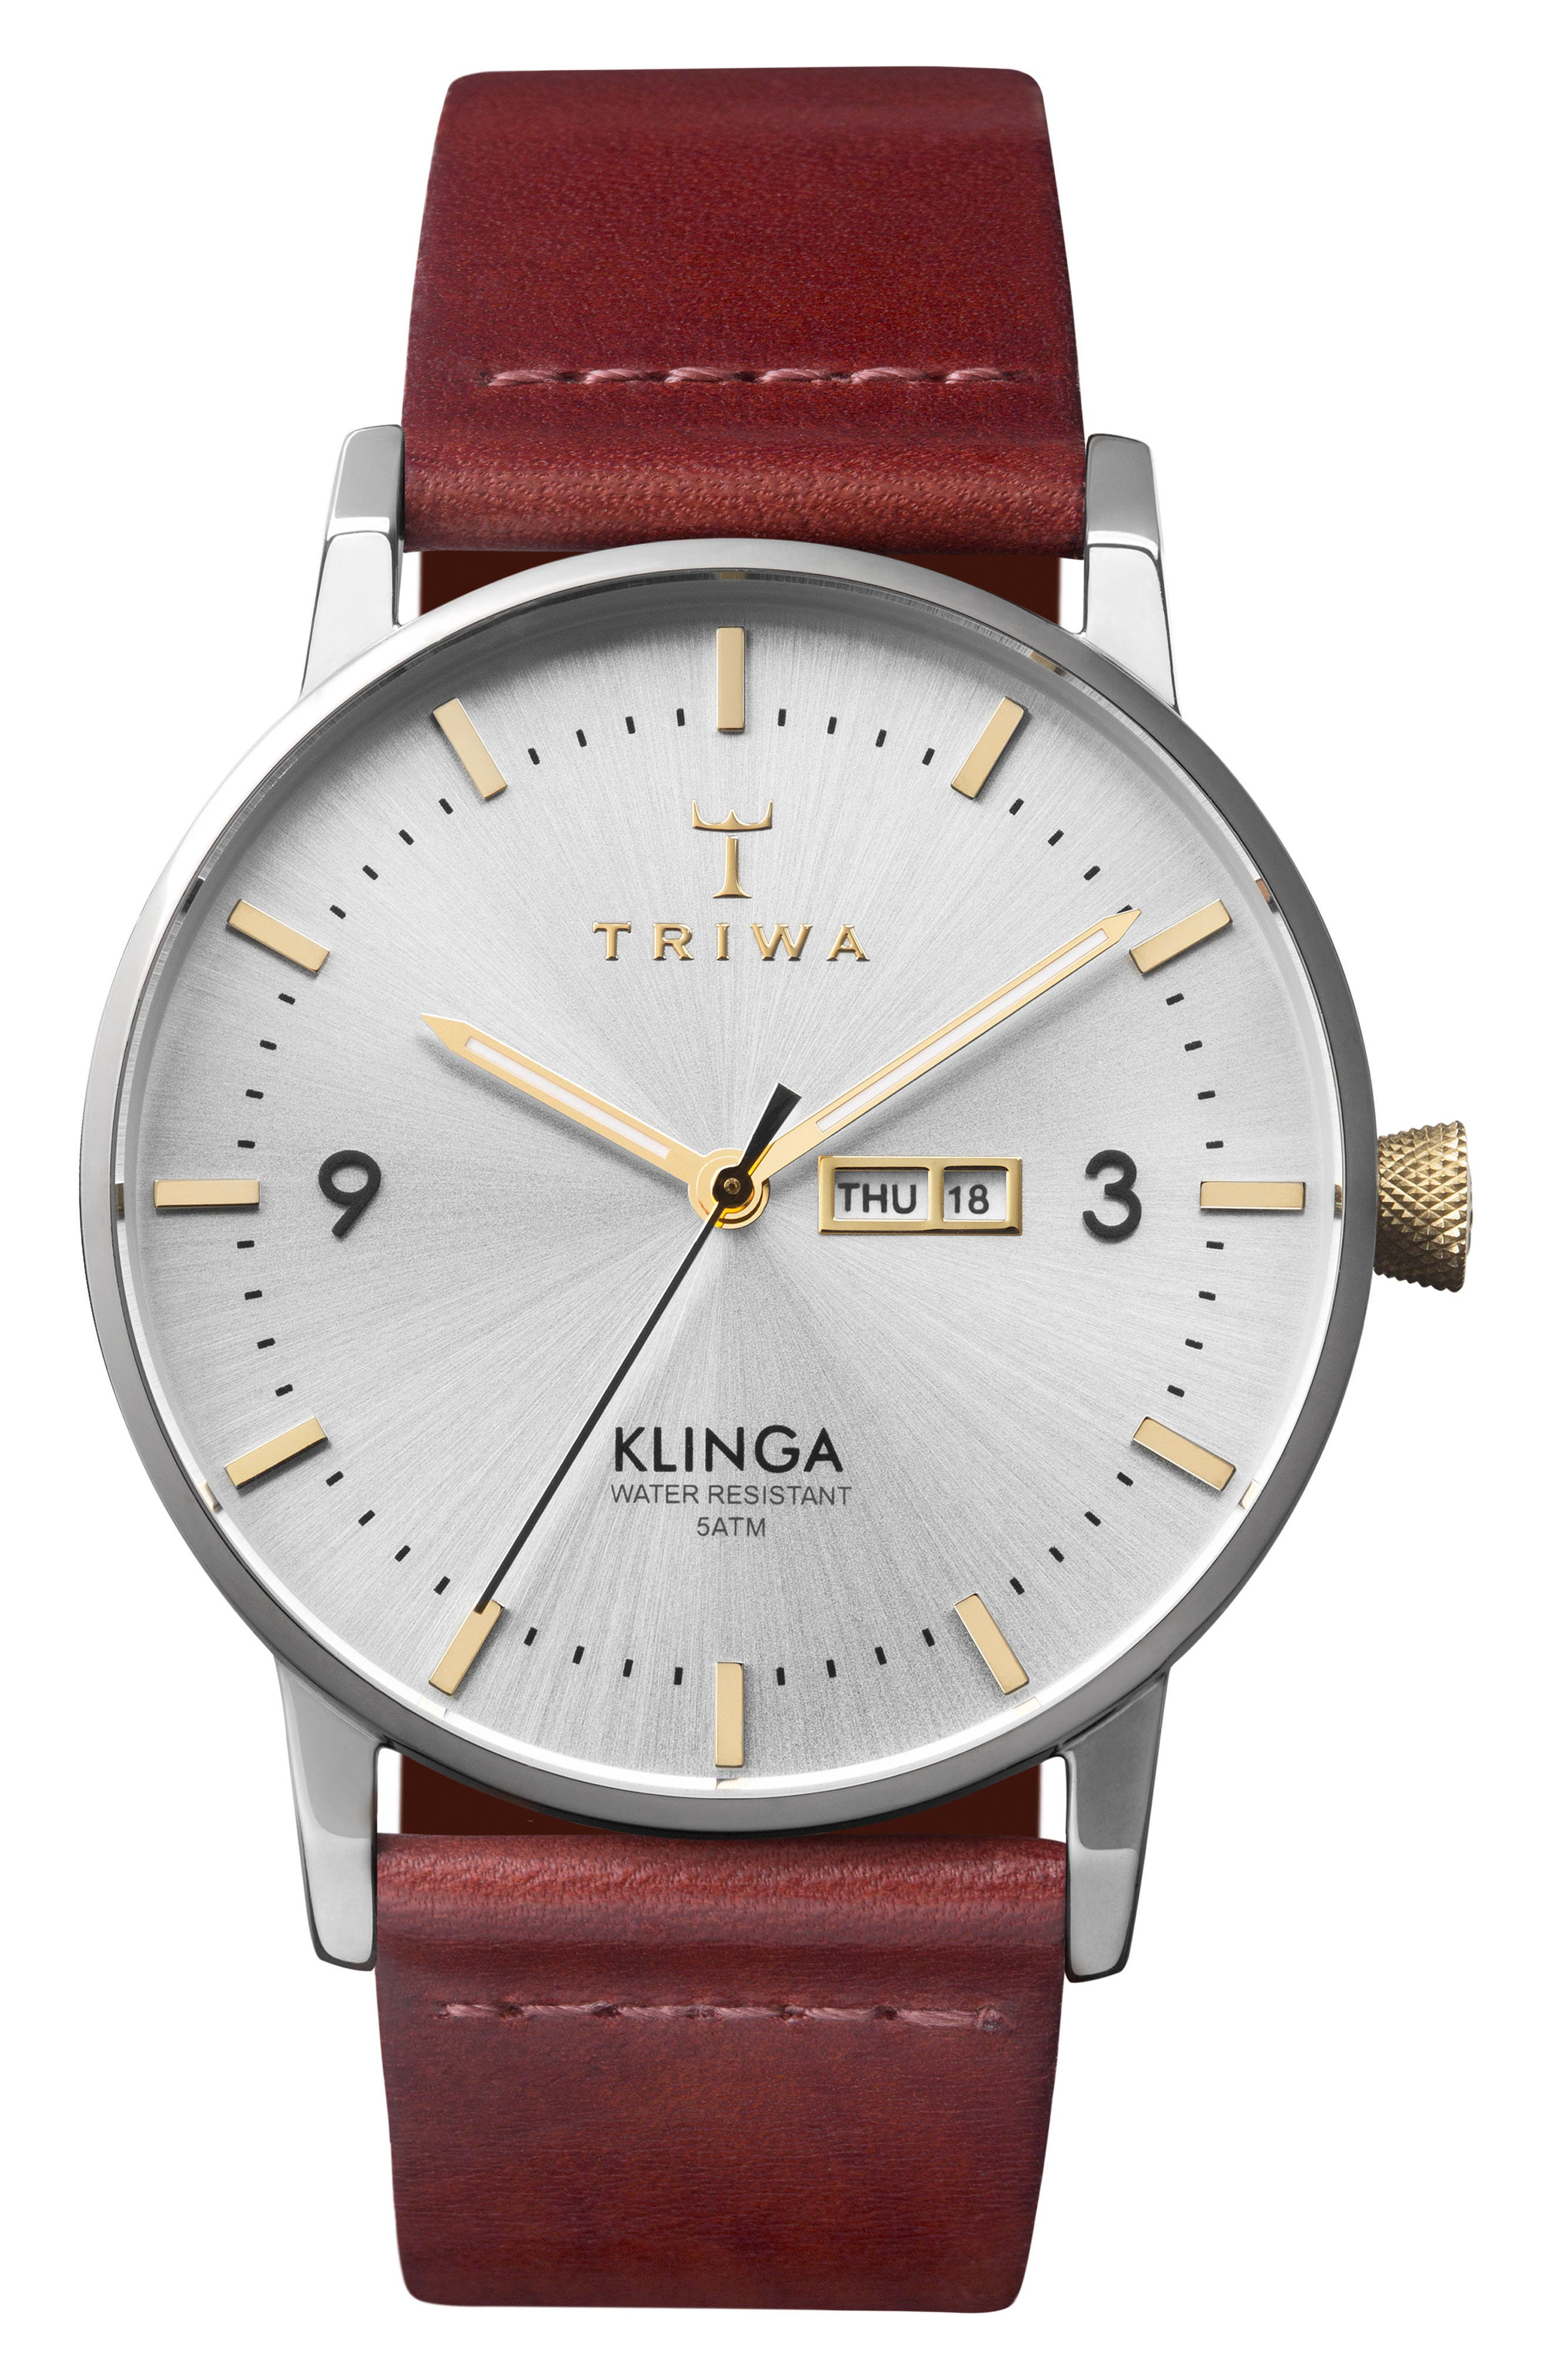 Main Image - TRIWA Klinga Leather Strap Watch, 38mm